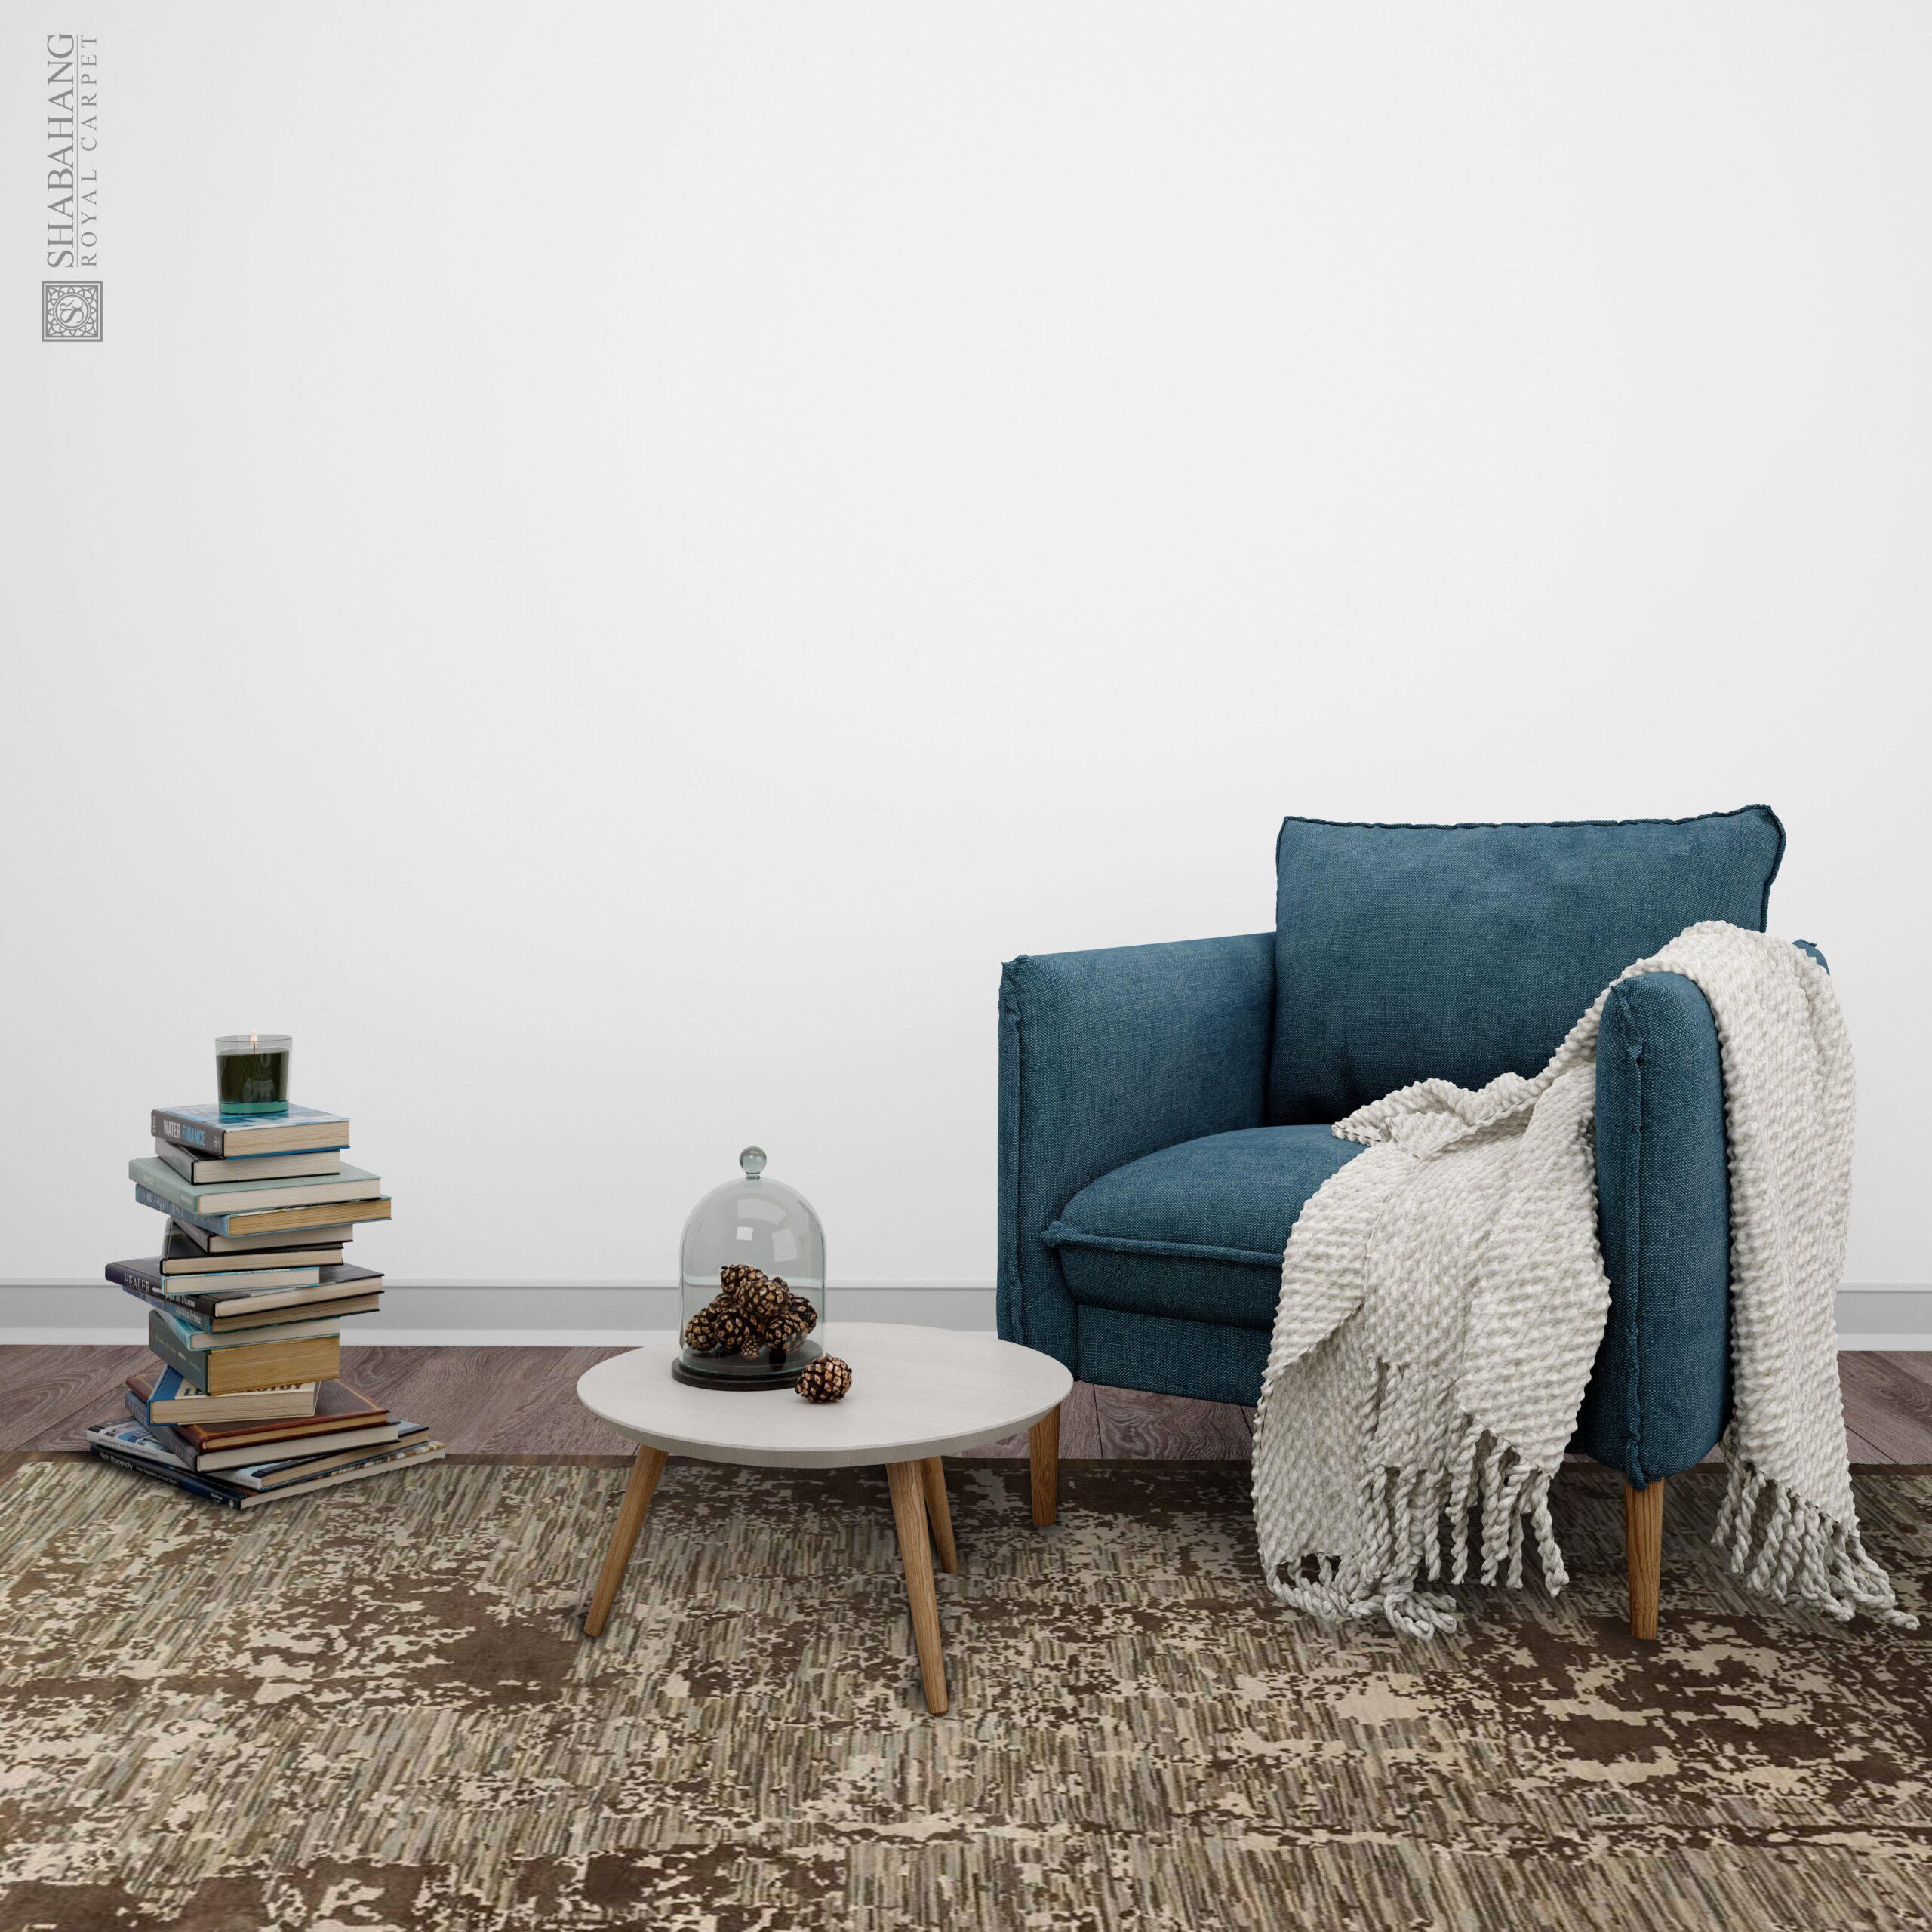 Digital 9' x 12' Handmade Area Rug - Shabahang Royal Carpet